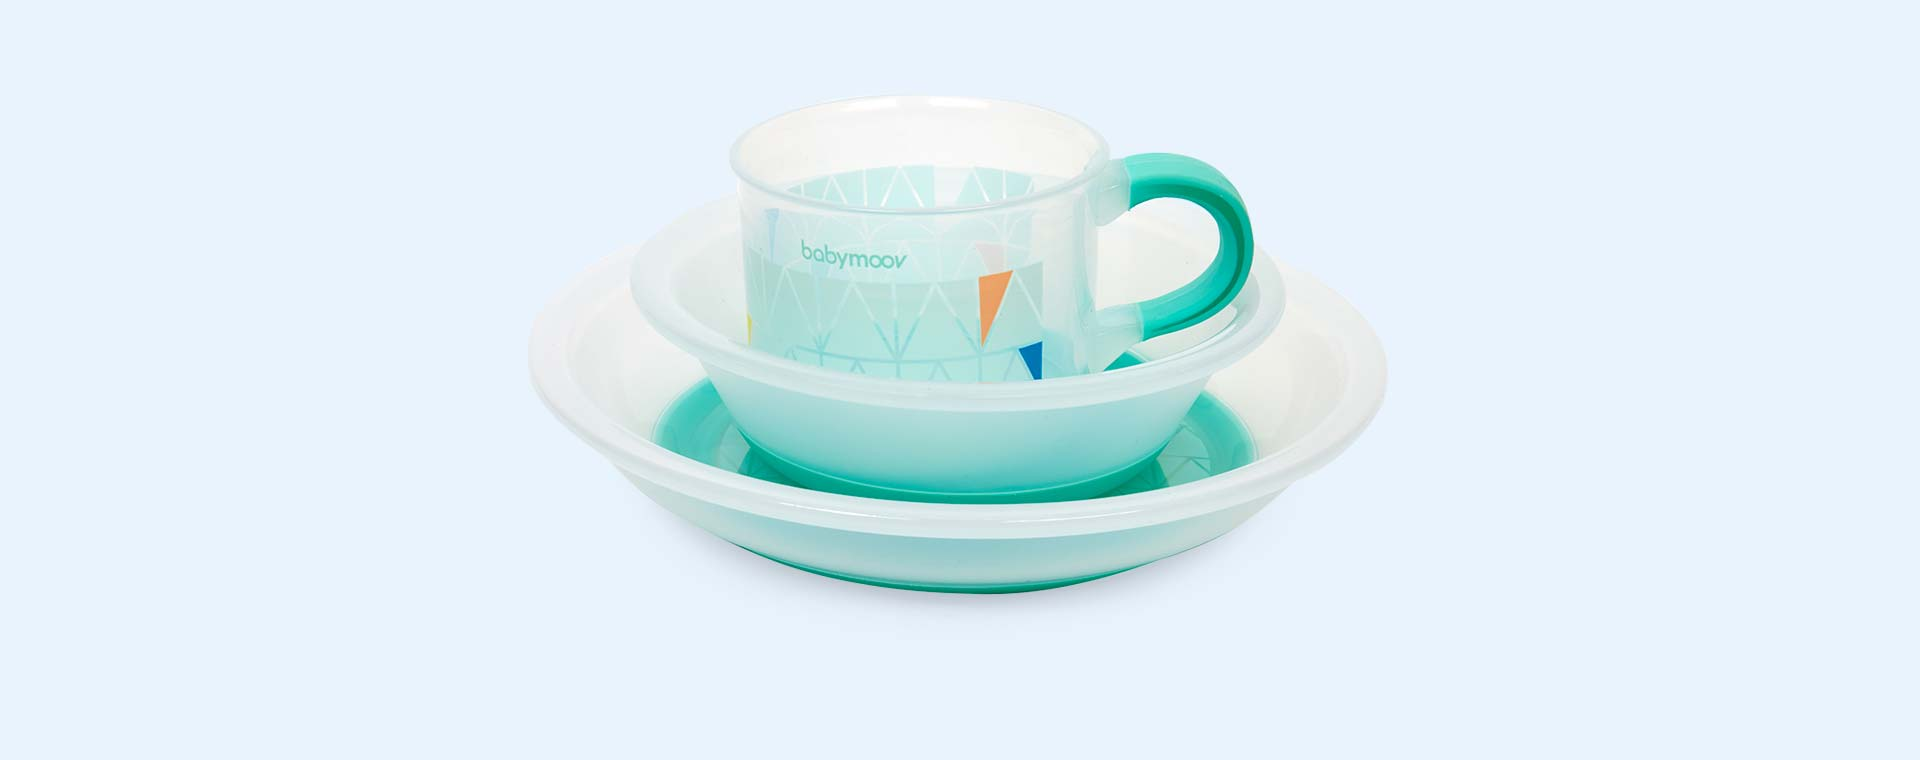 Blue Babymoov Non-Slip Bowl